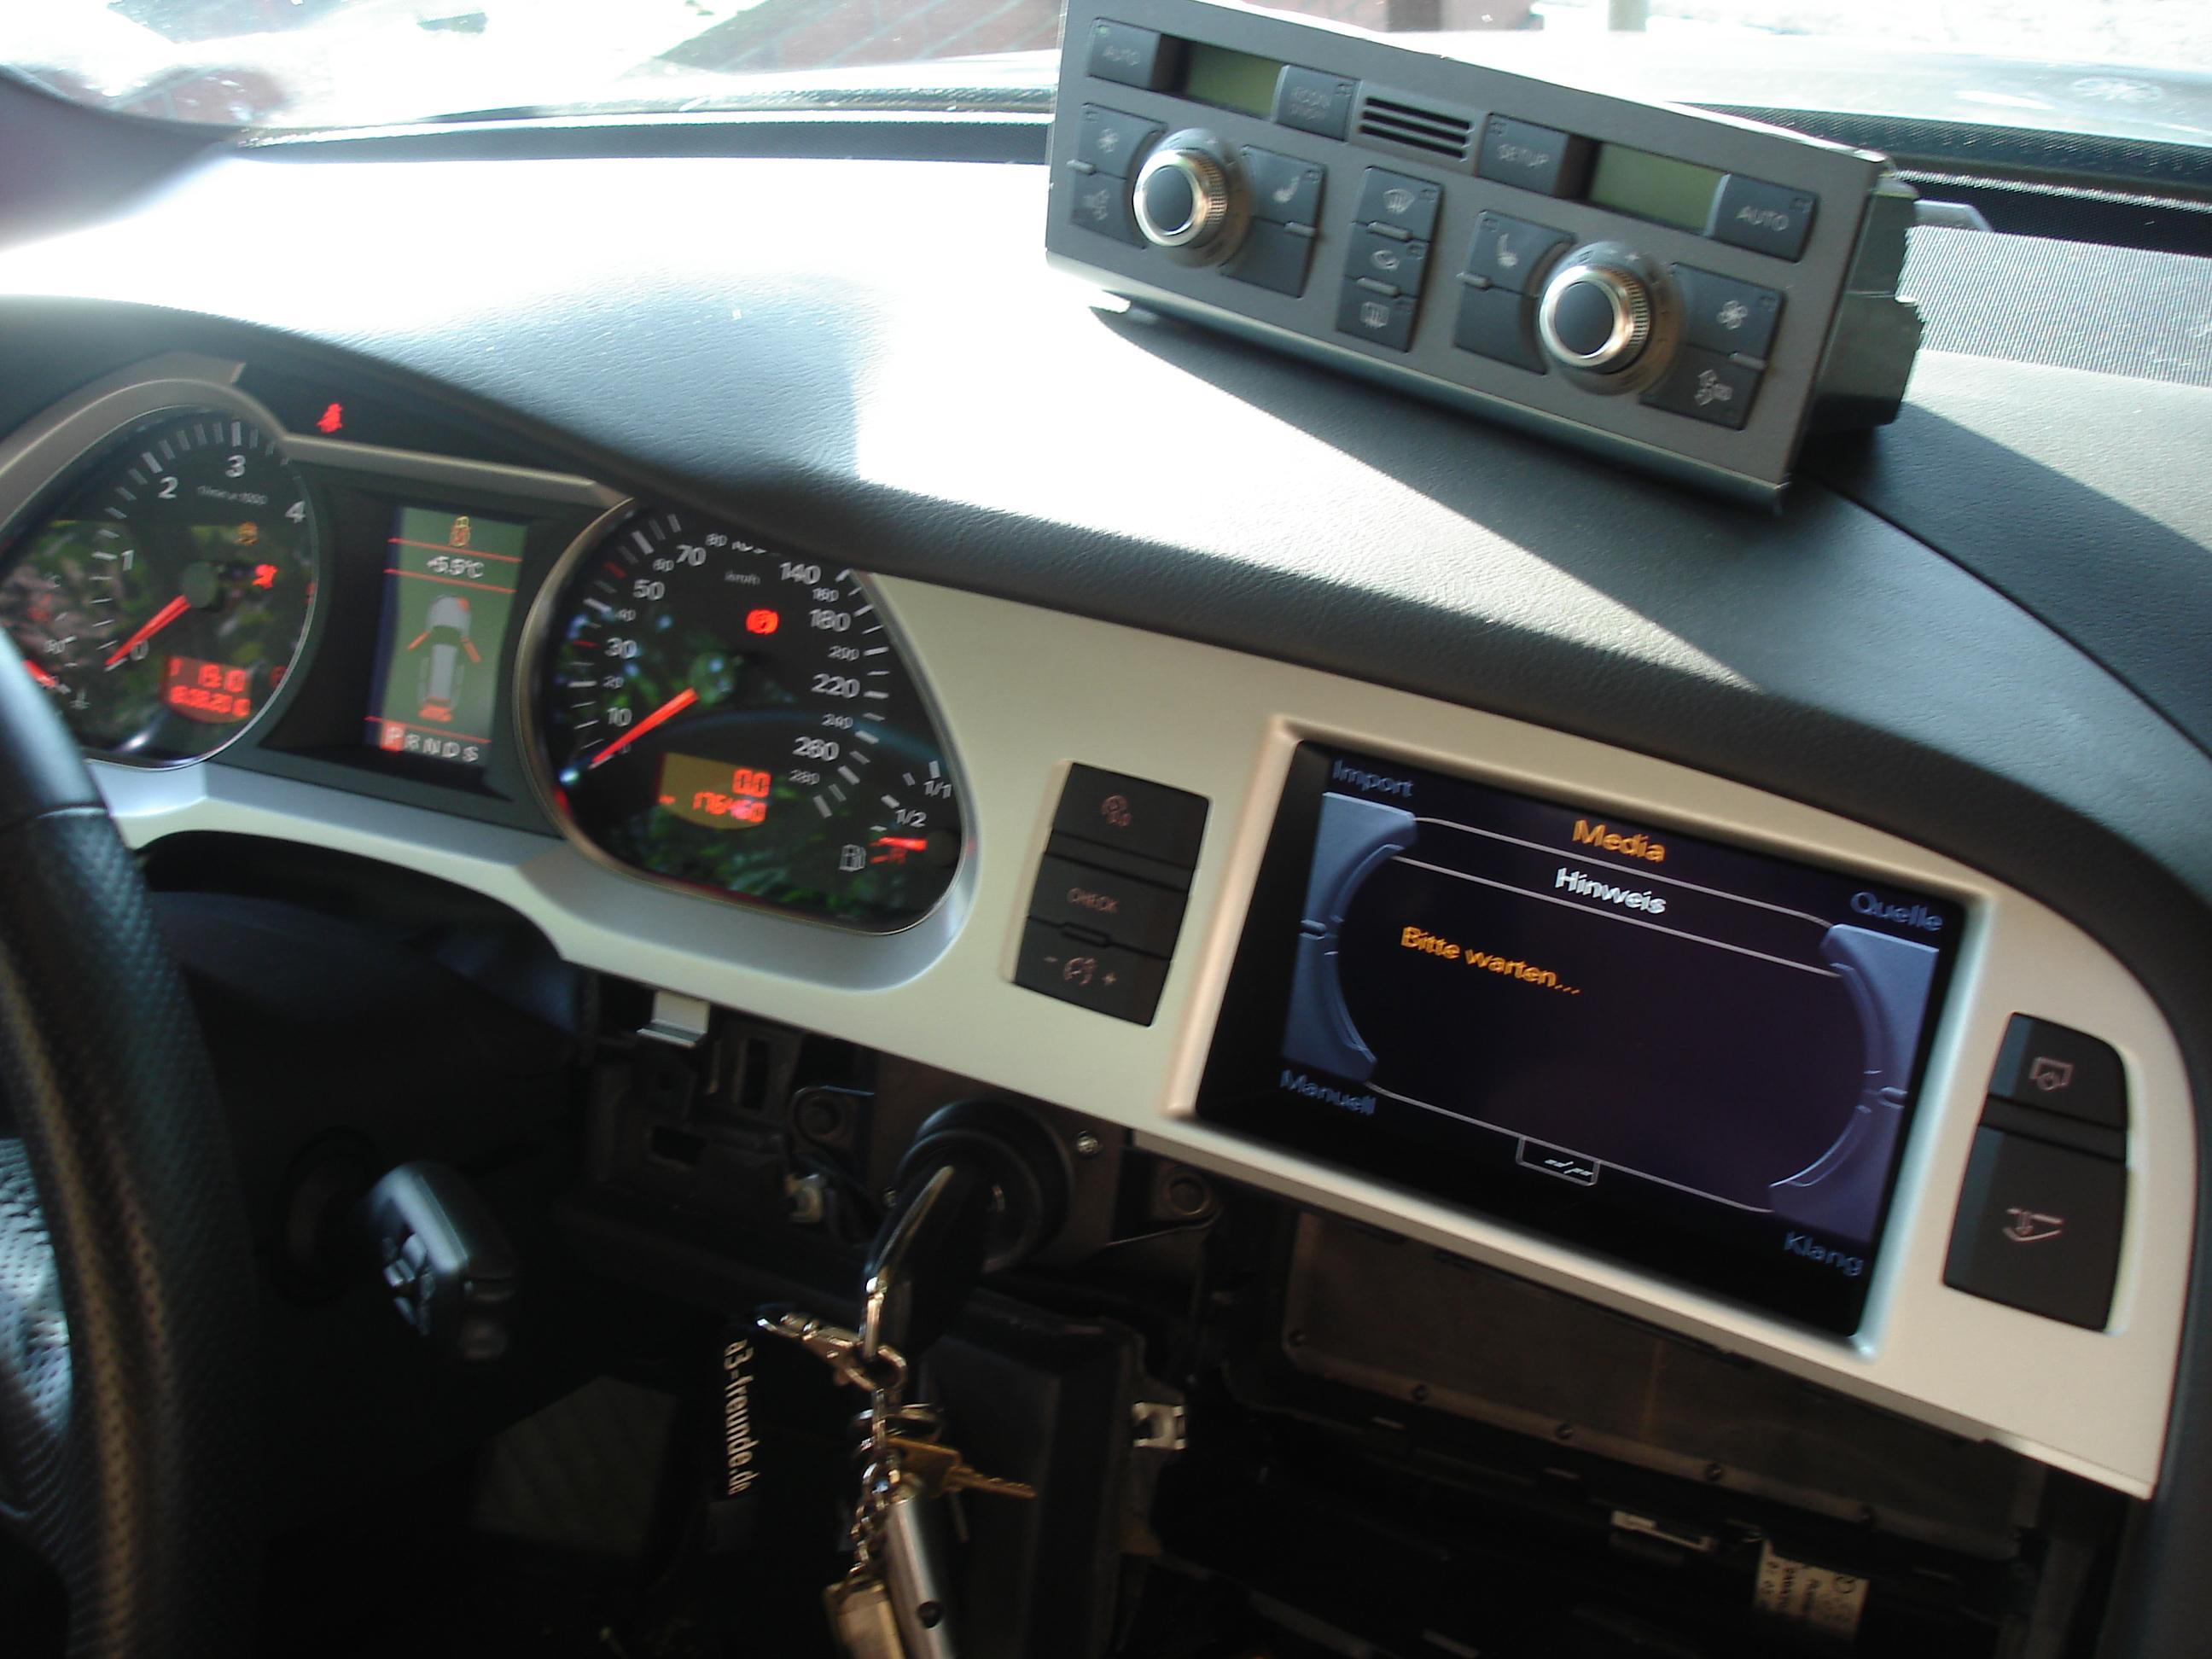 4f Mmi 3g Umbau In Meinem Dickschiff Audi A3 Forum F 252 R